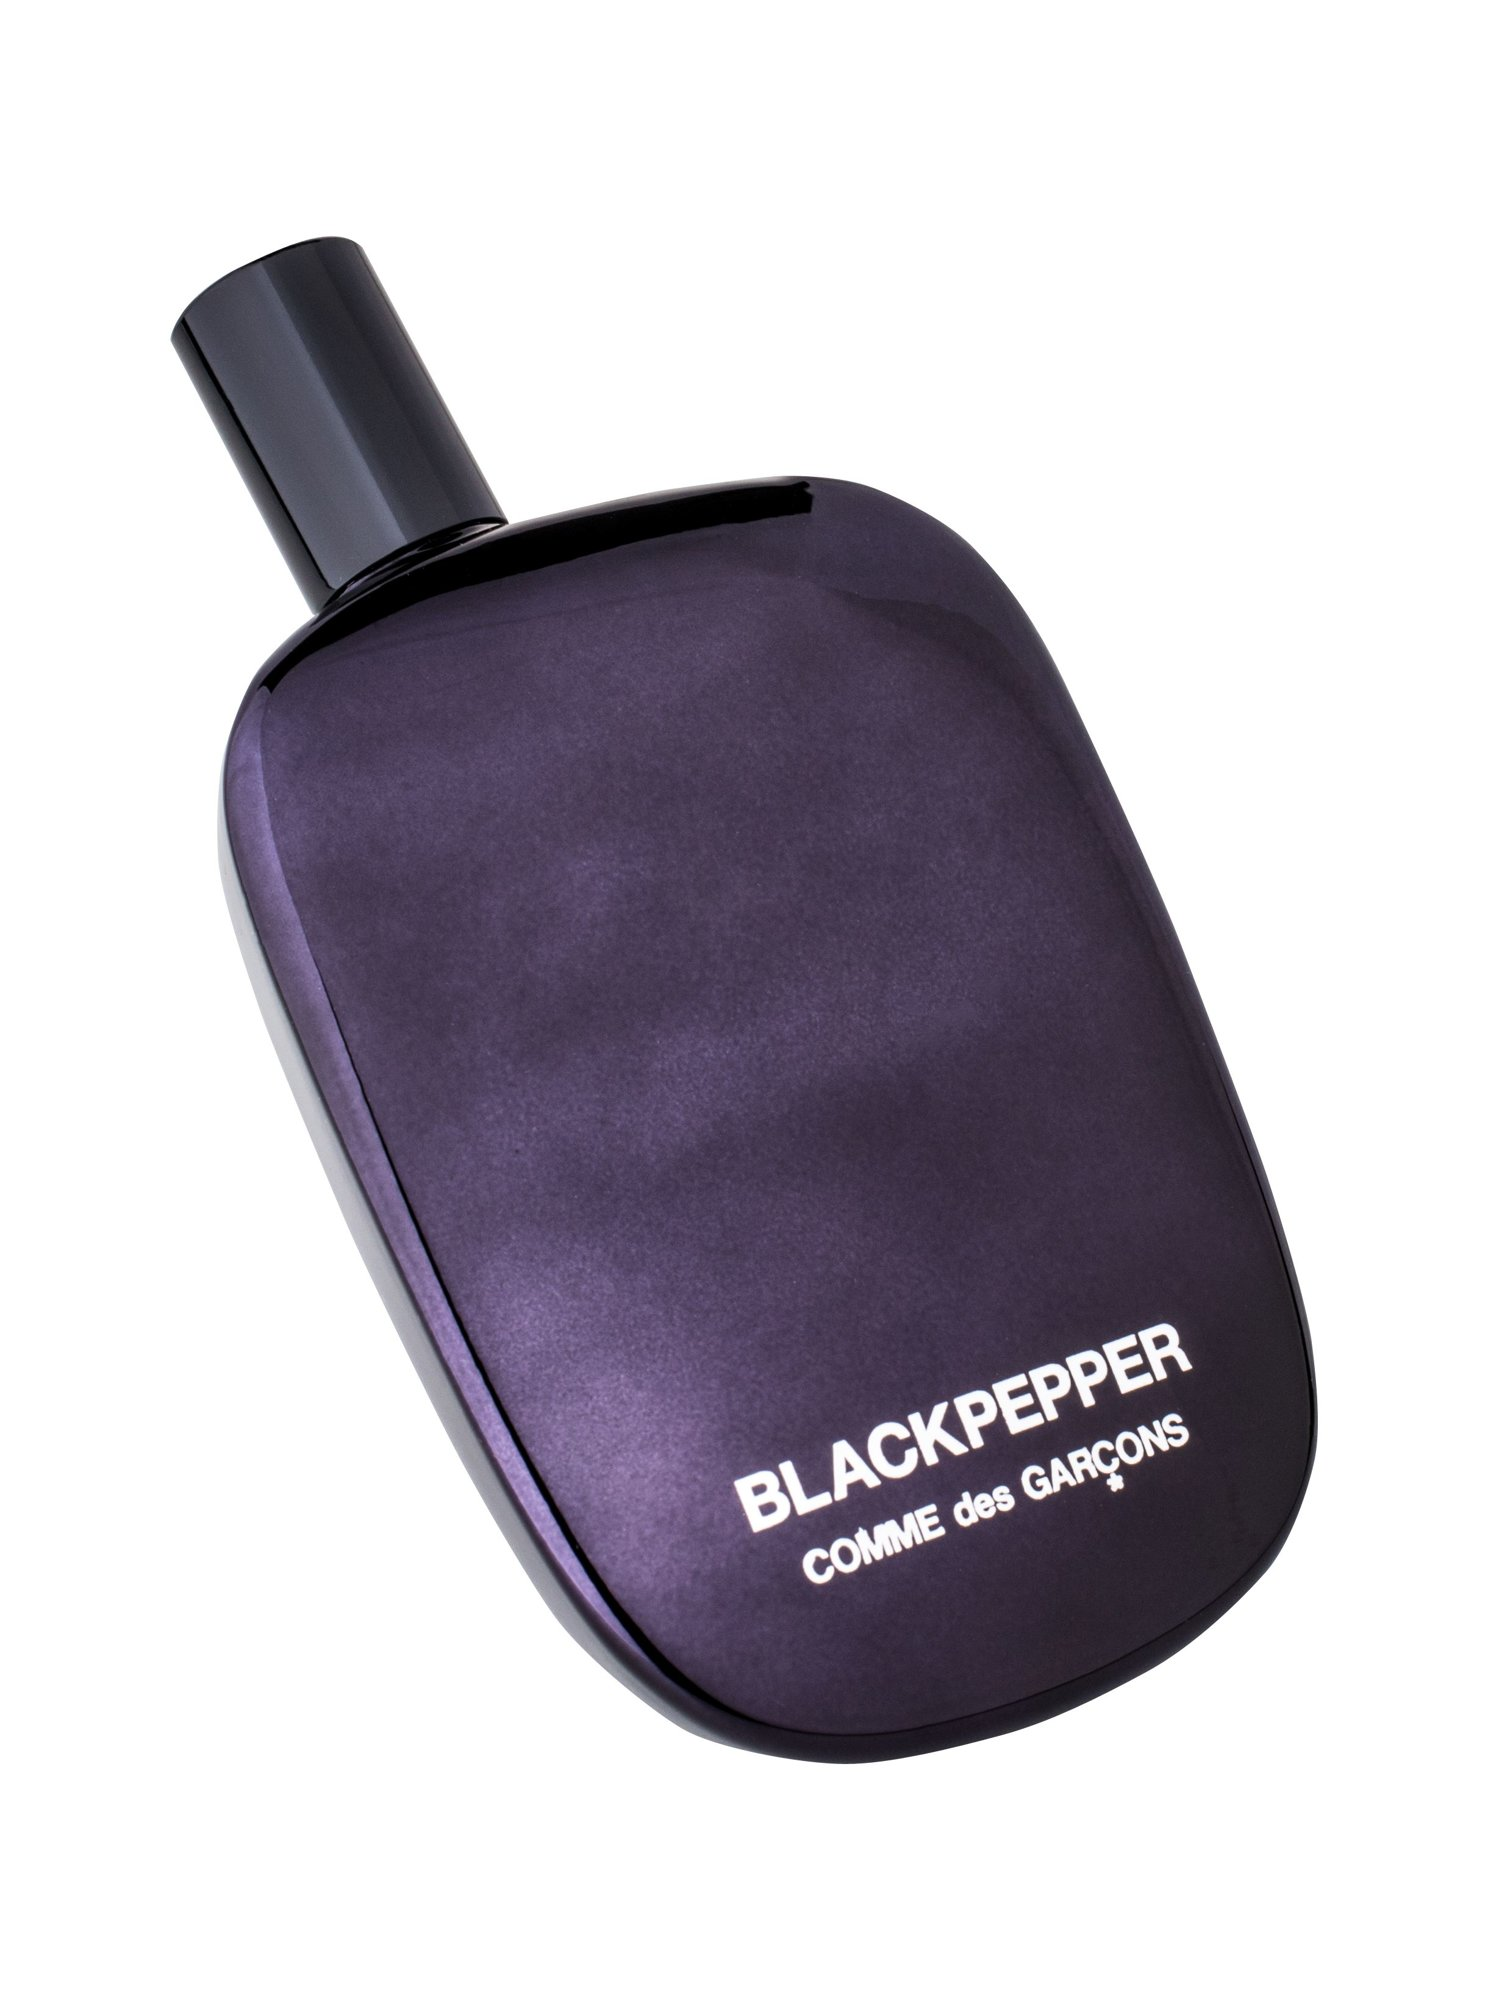 COMME des GARCONS Blackpepper EDP 100ml